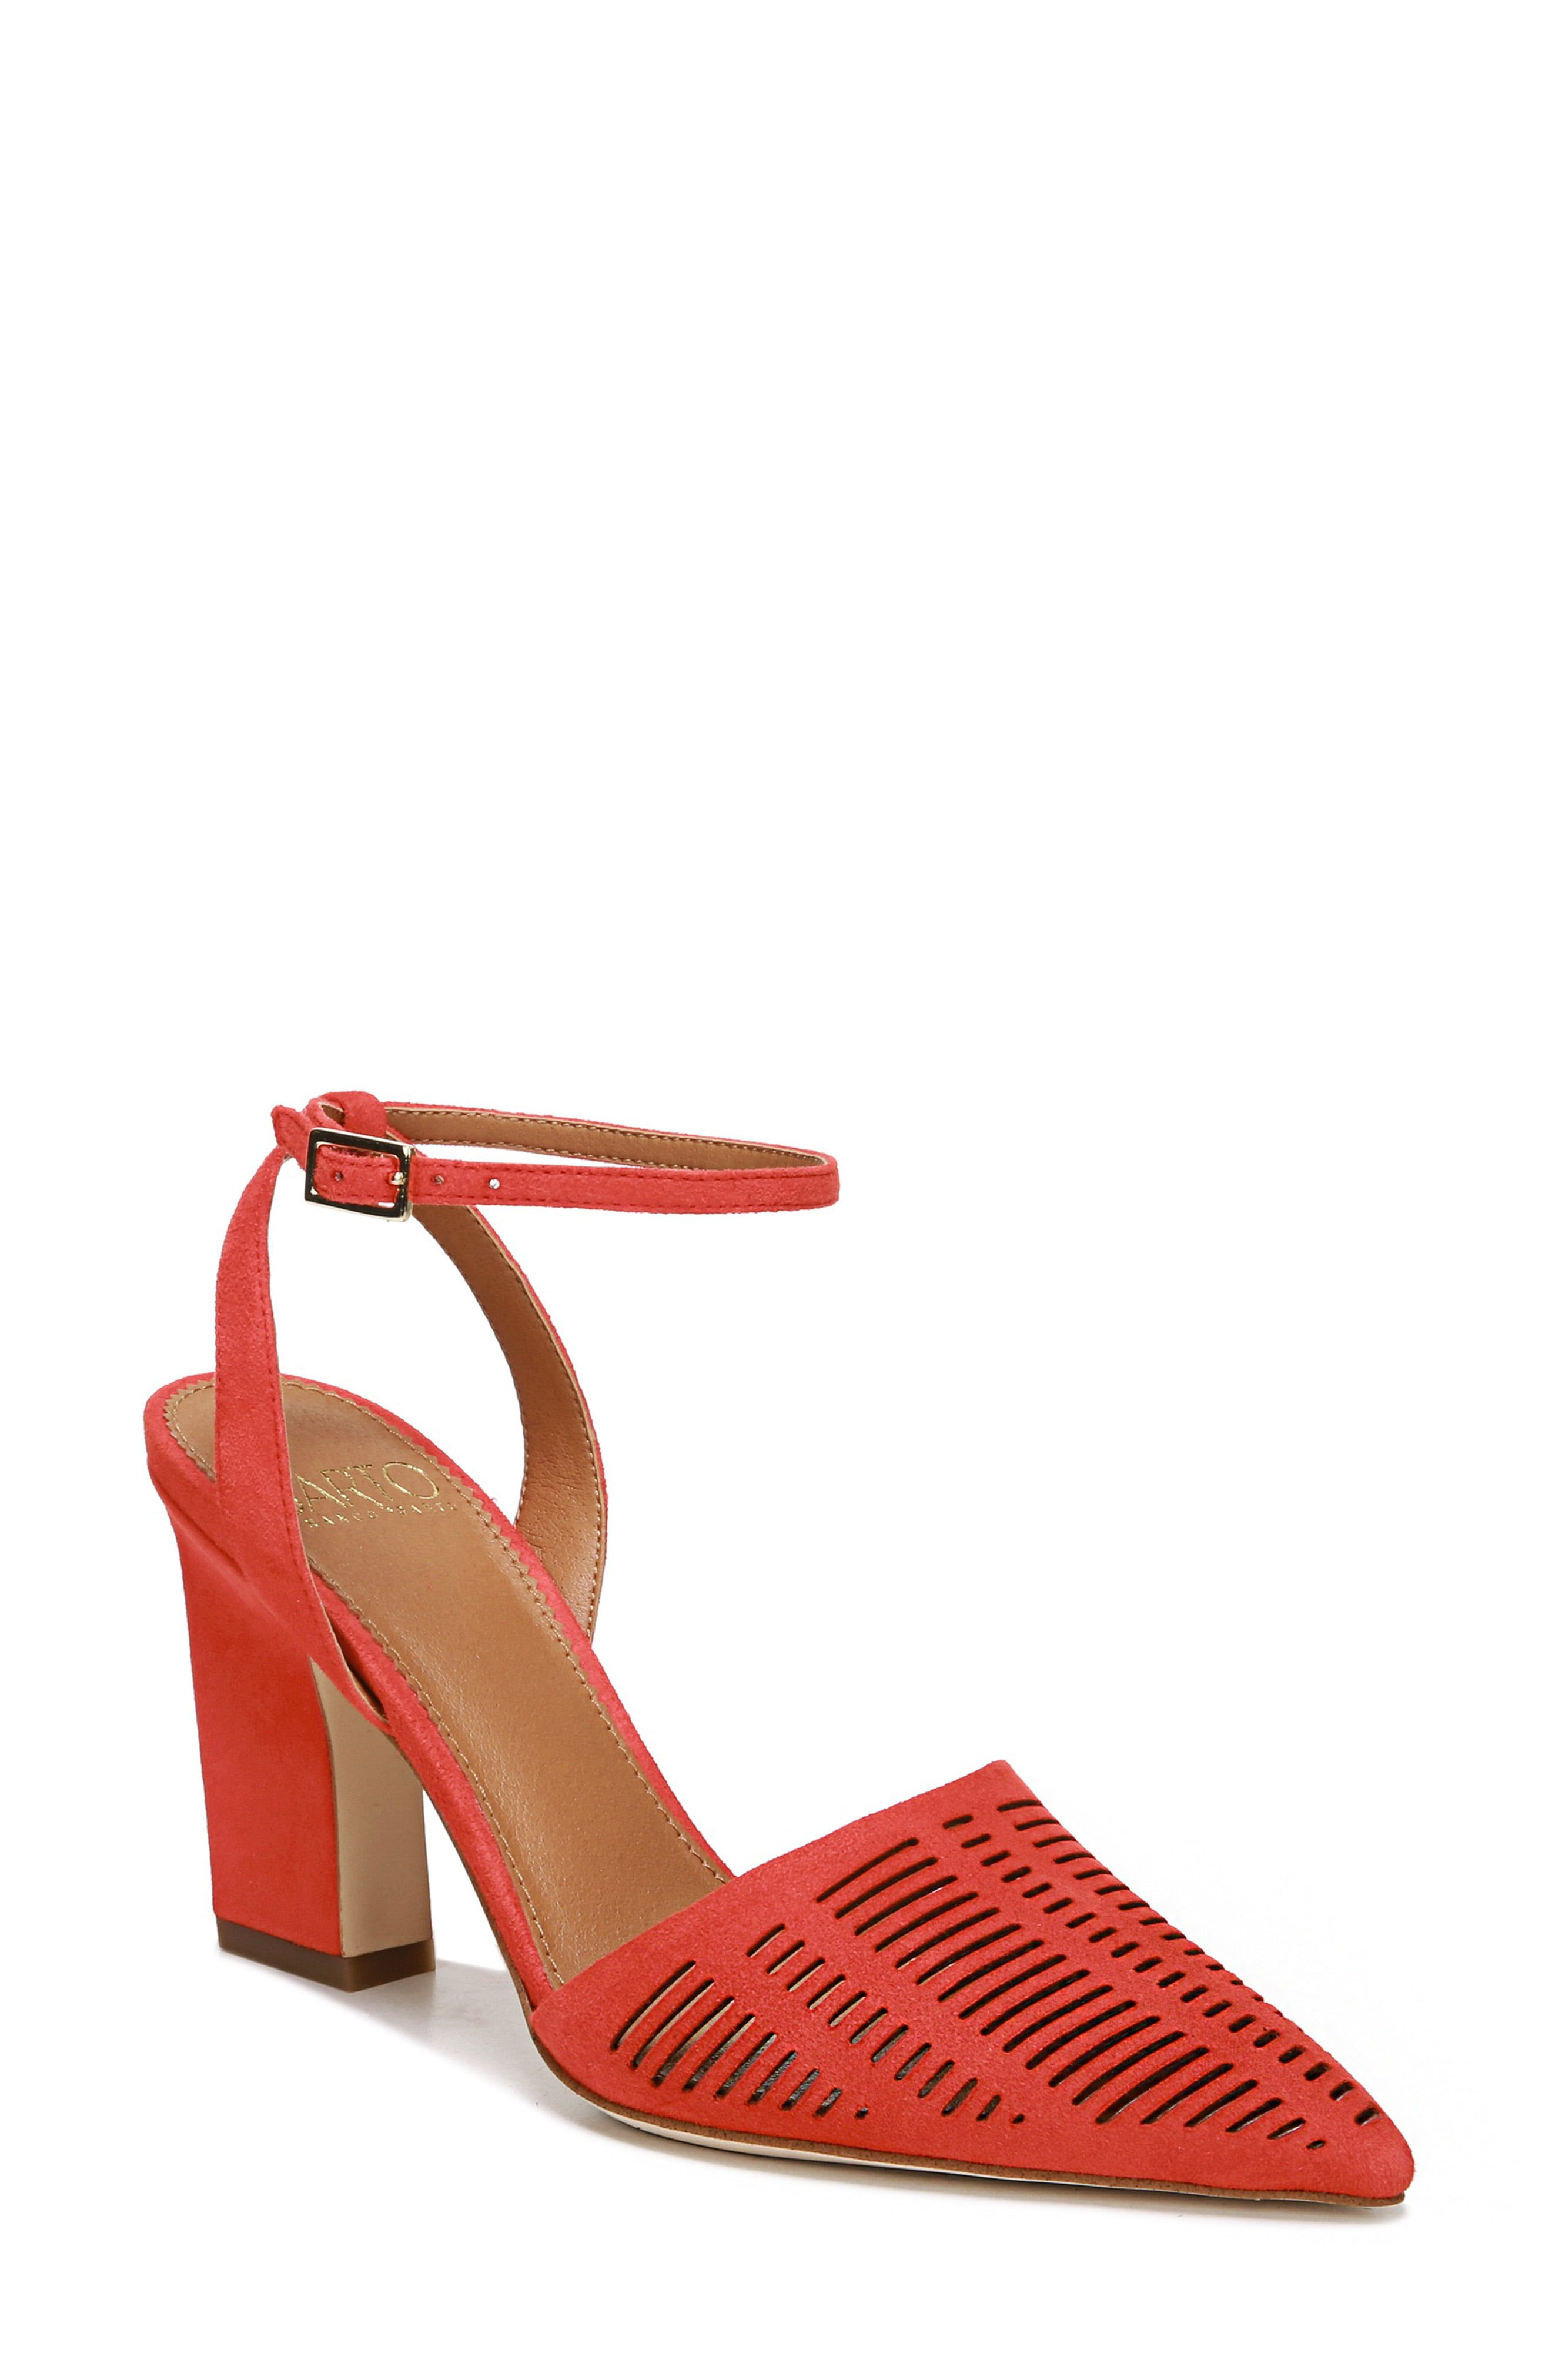 2ef1bdfb9 Women's Sarto By Franco Sarto Starla Ankle Strap Pump, Size 7.5 M - Red